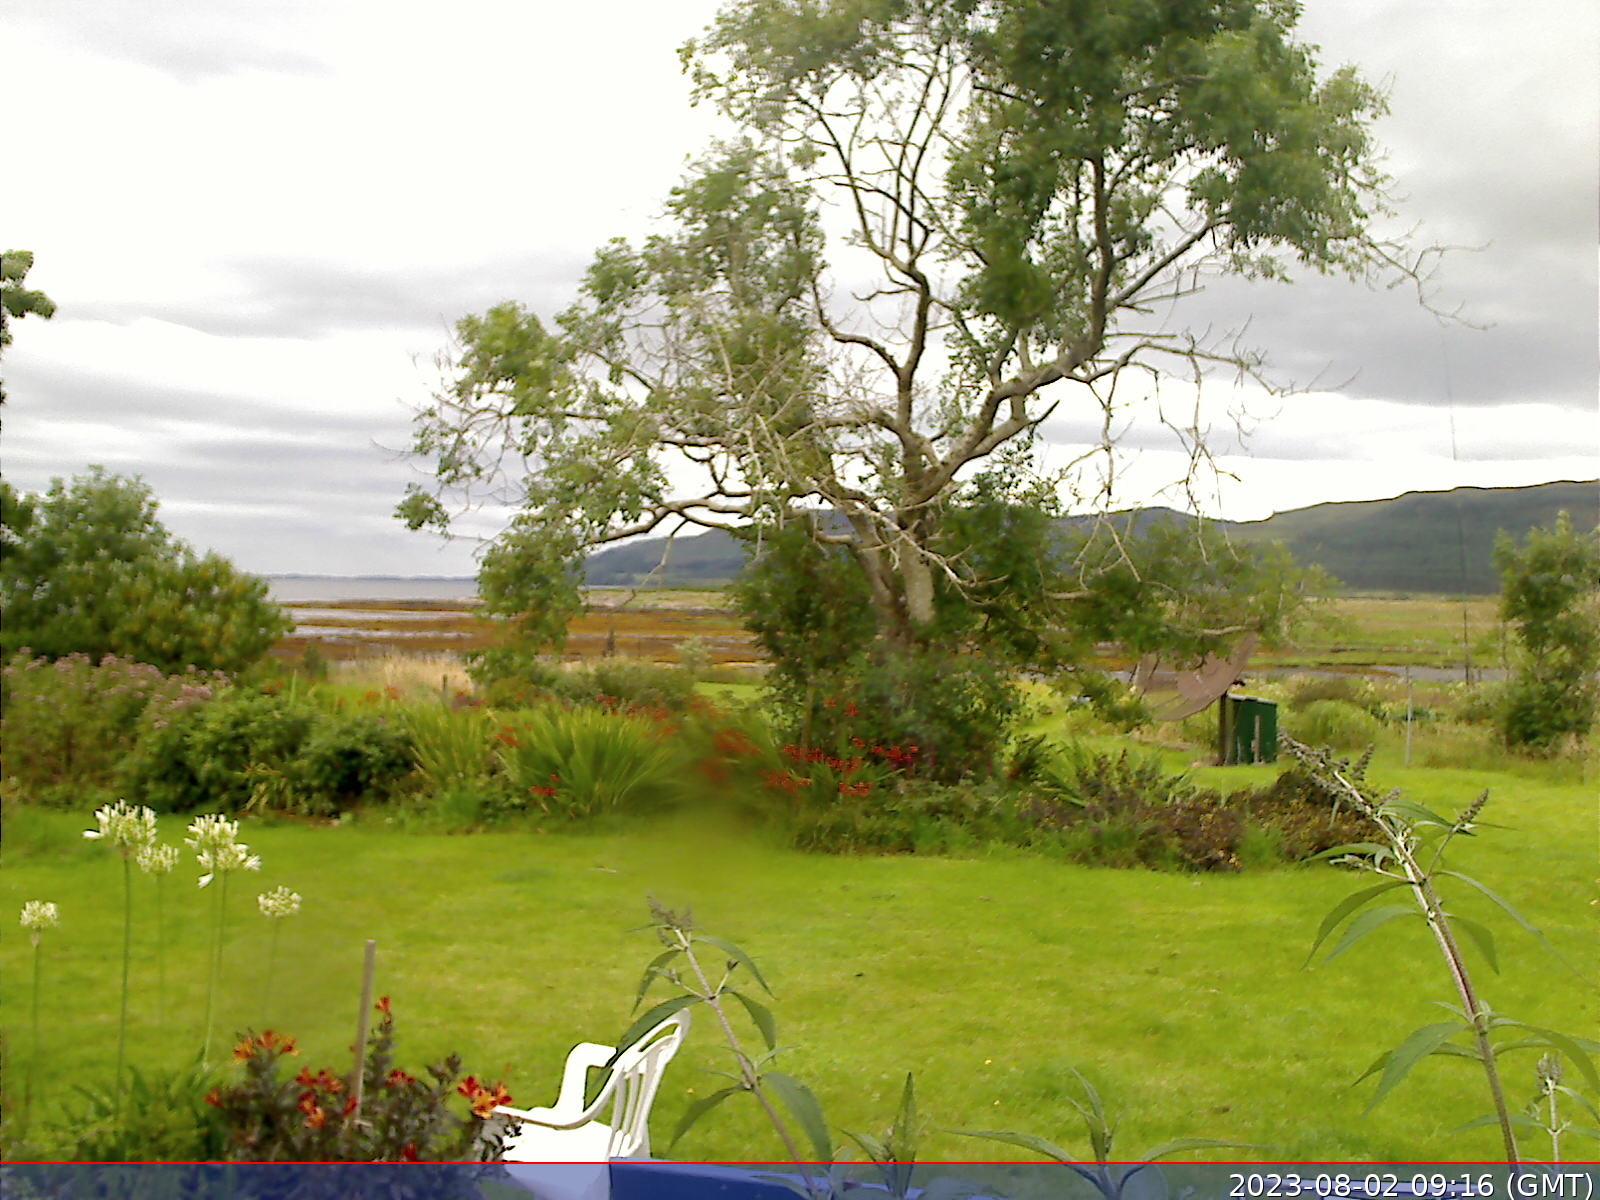 Web Camera is located in Scotland.